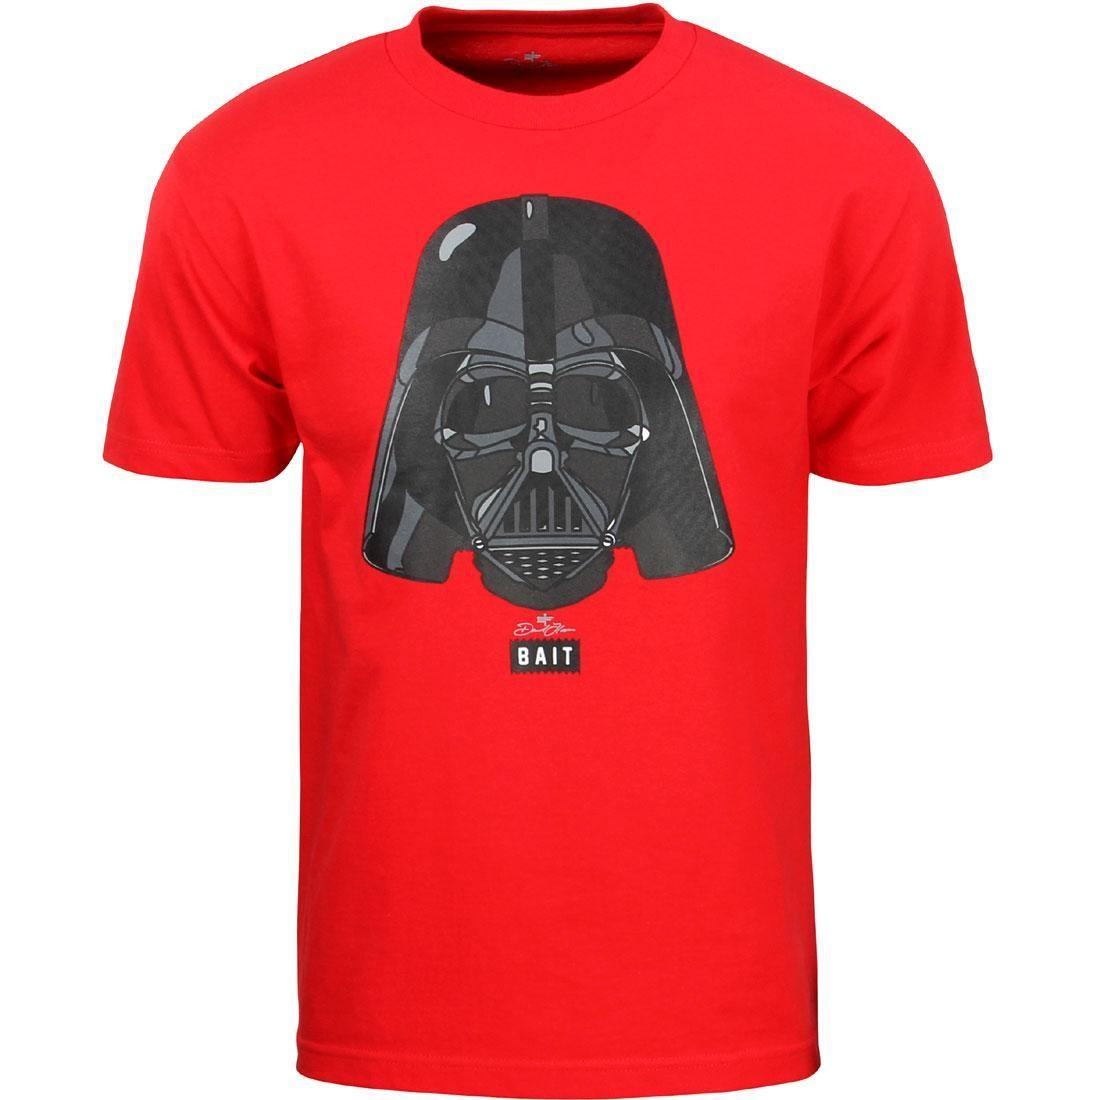 BAIT x David Flores Men Vader Tee (red)